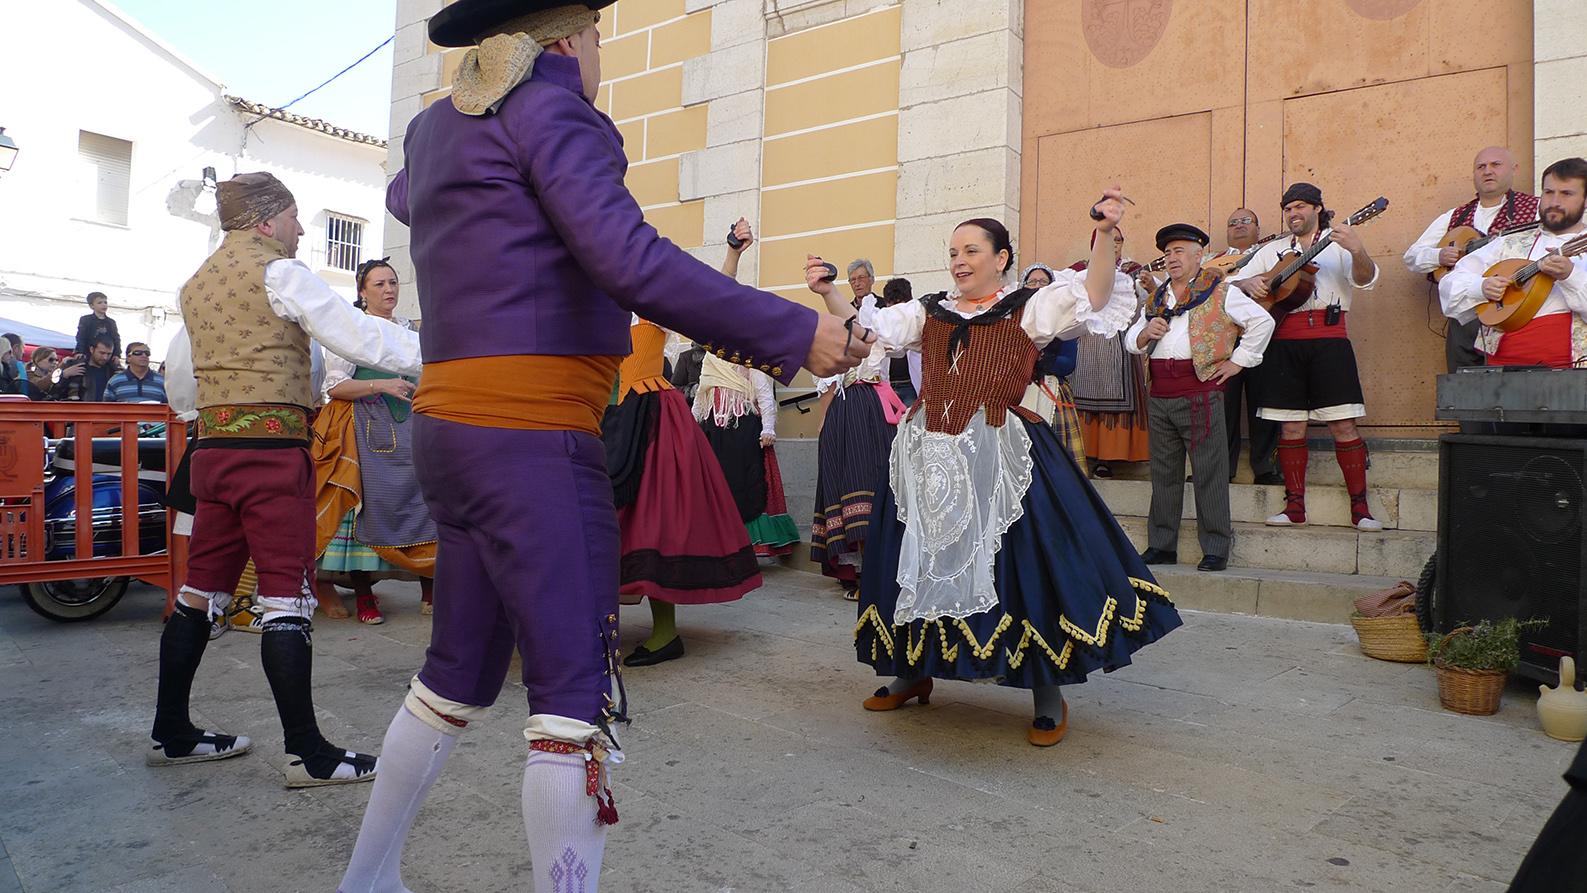 2014-02-23 - Baladre a Fira St. Marcia-ROTOVA (32)